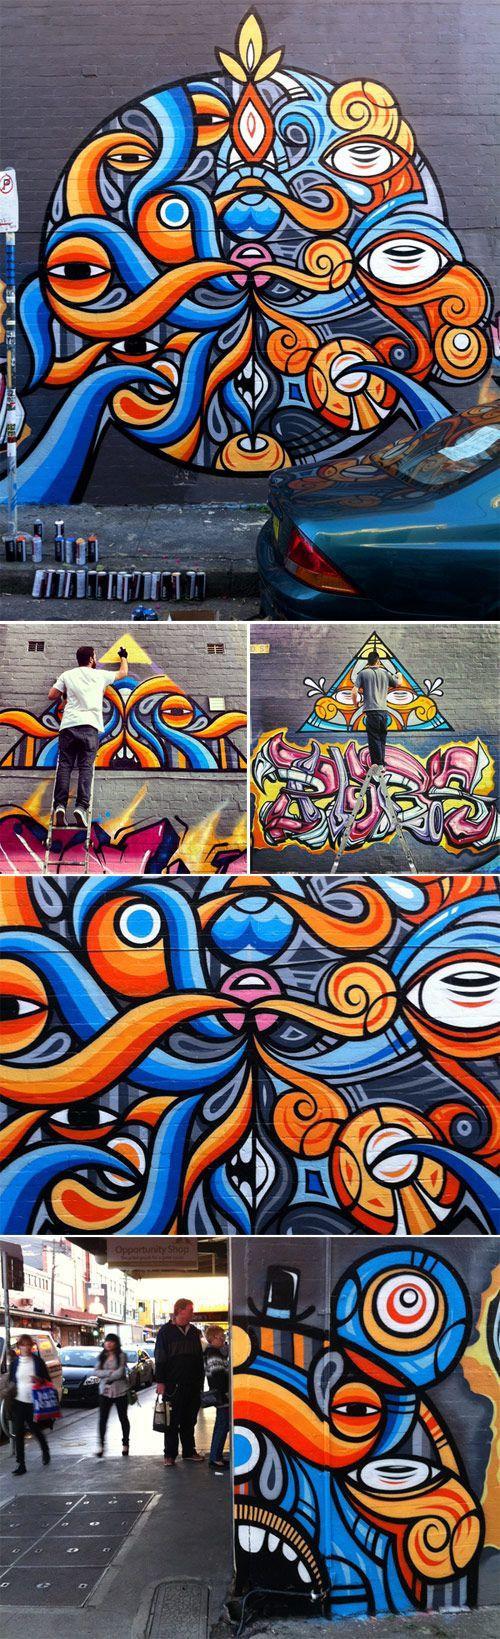 Graffiti art information - Street Art Australia